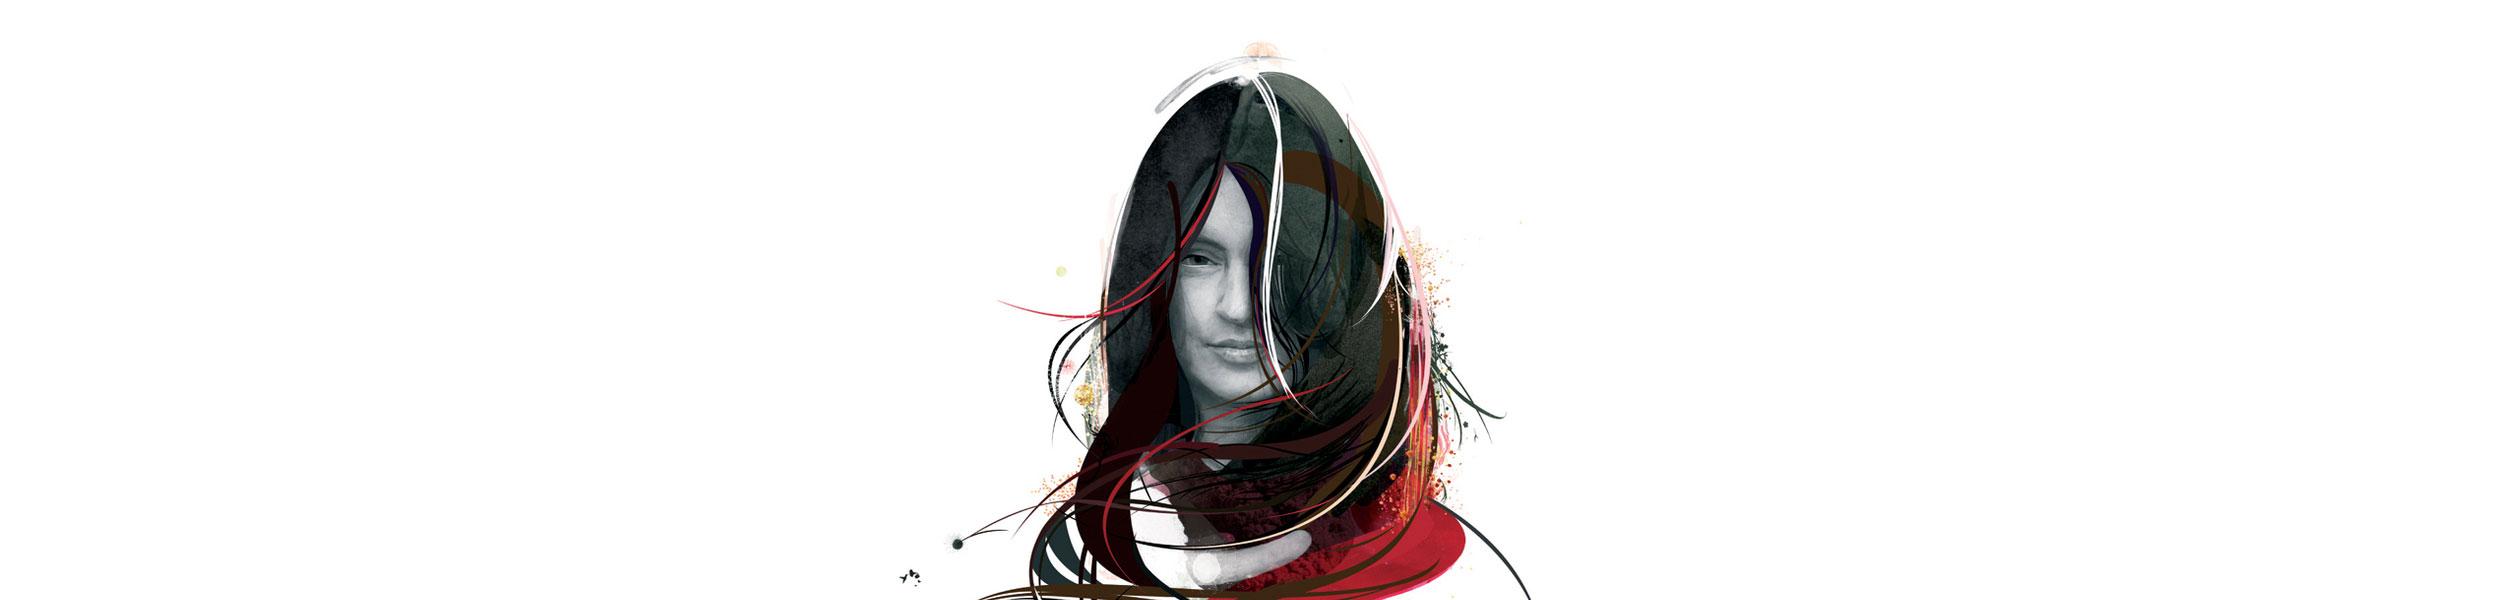 Emma Pollock - title